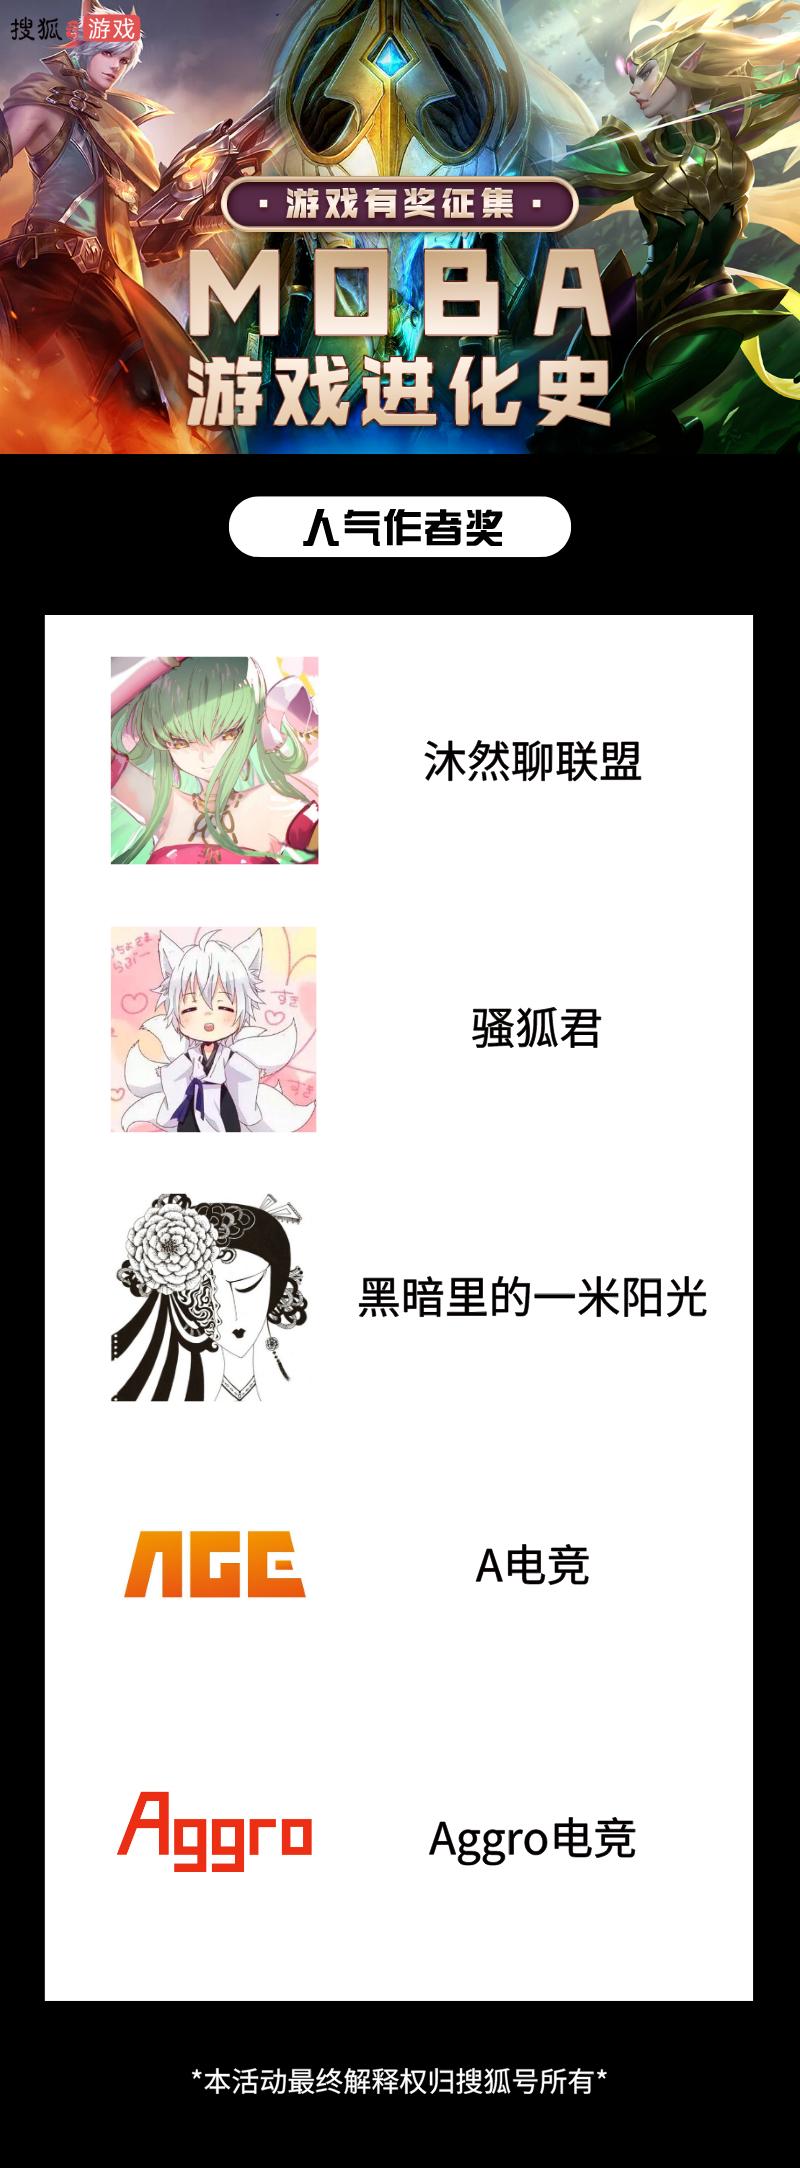 """MOBA游戏进化史""奖项公布_征文活动"